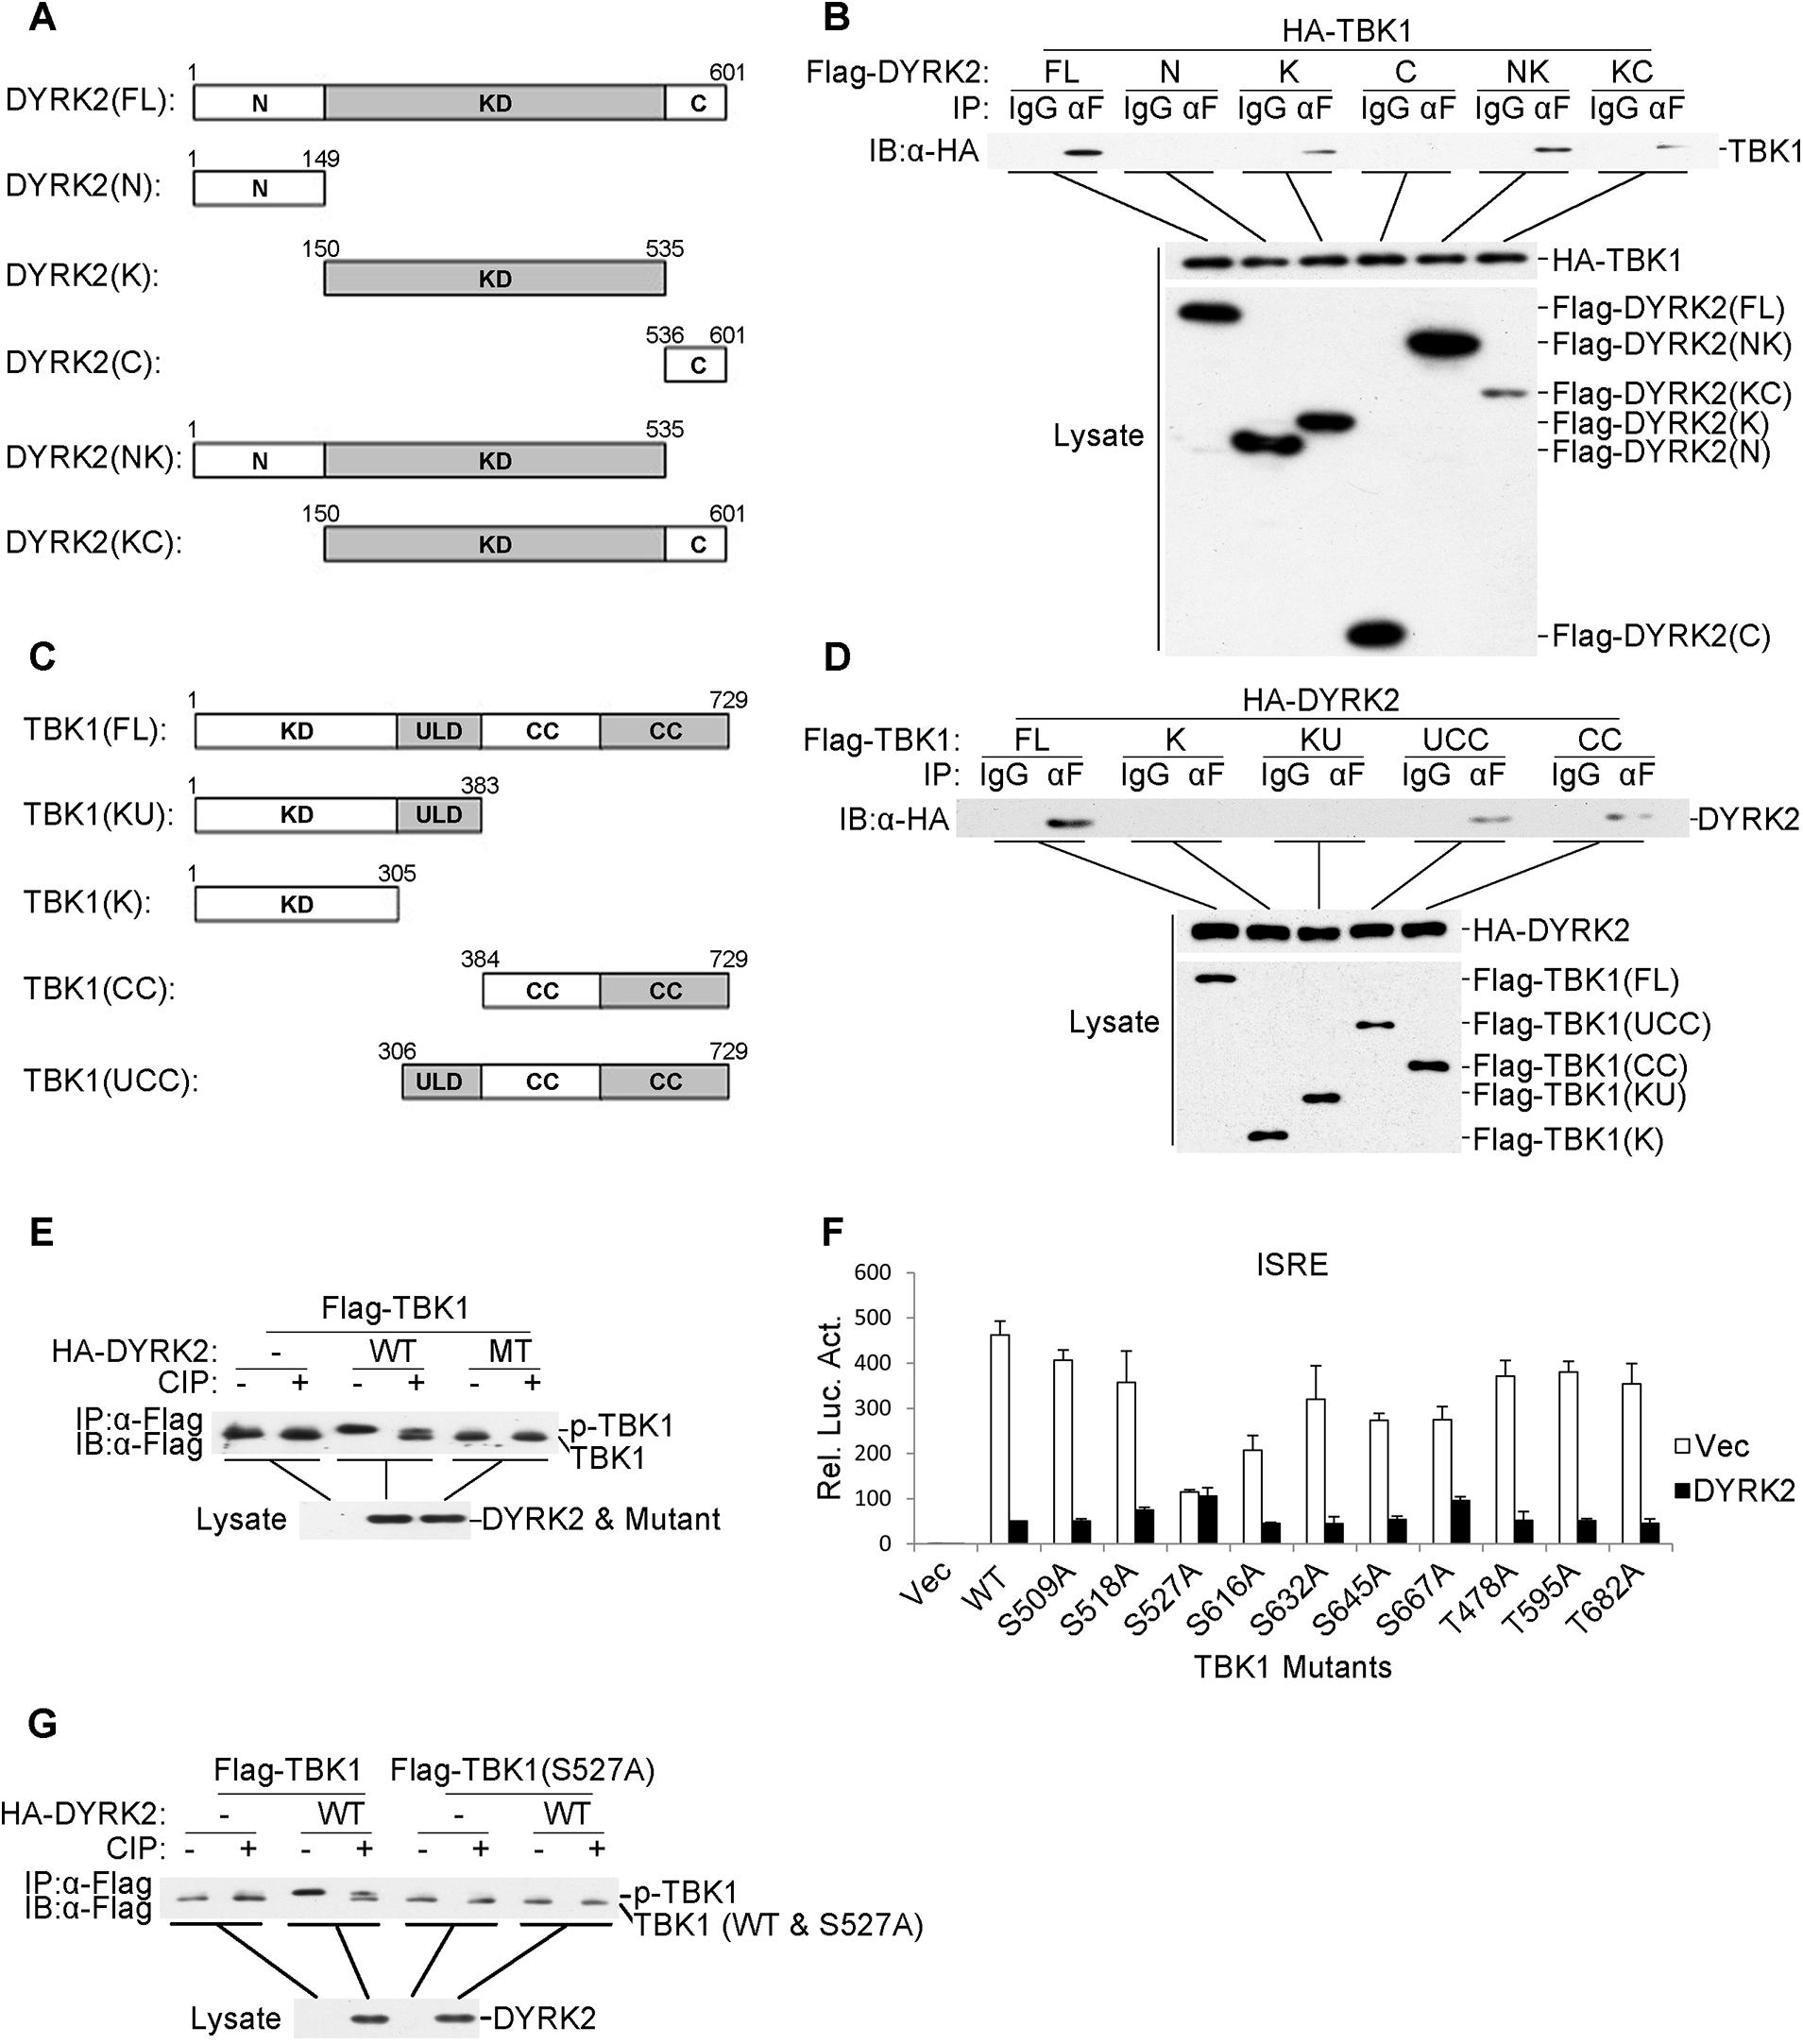 DYRK2 phosphorylated TBK1 at S527.